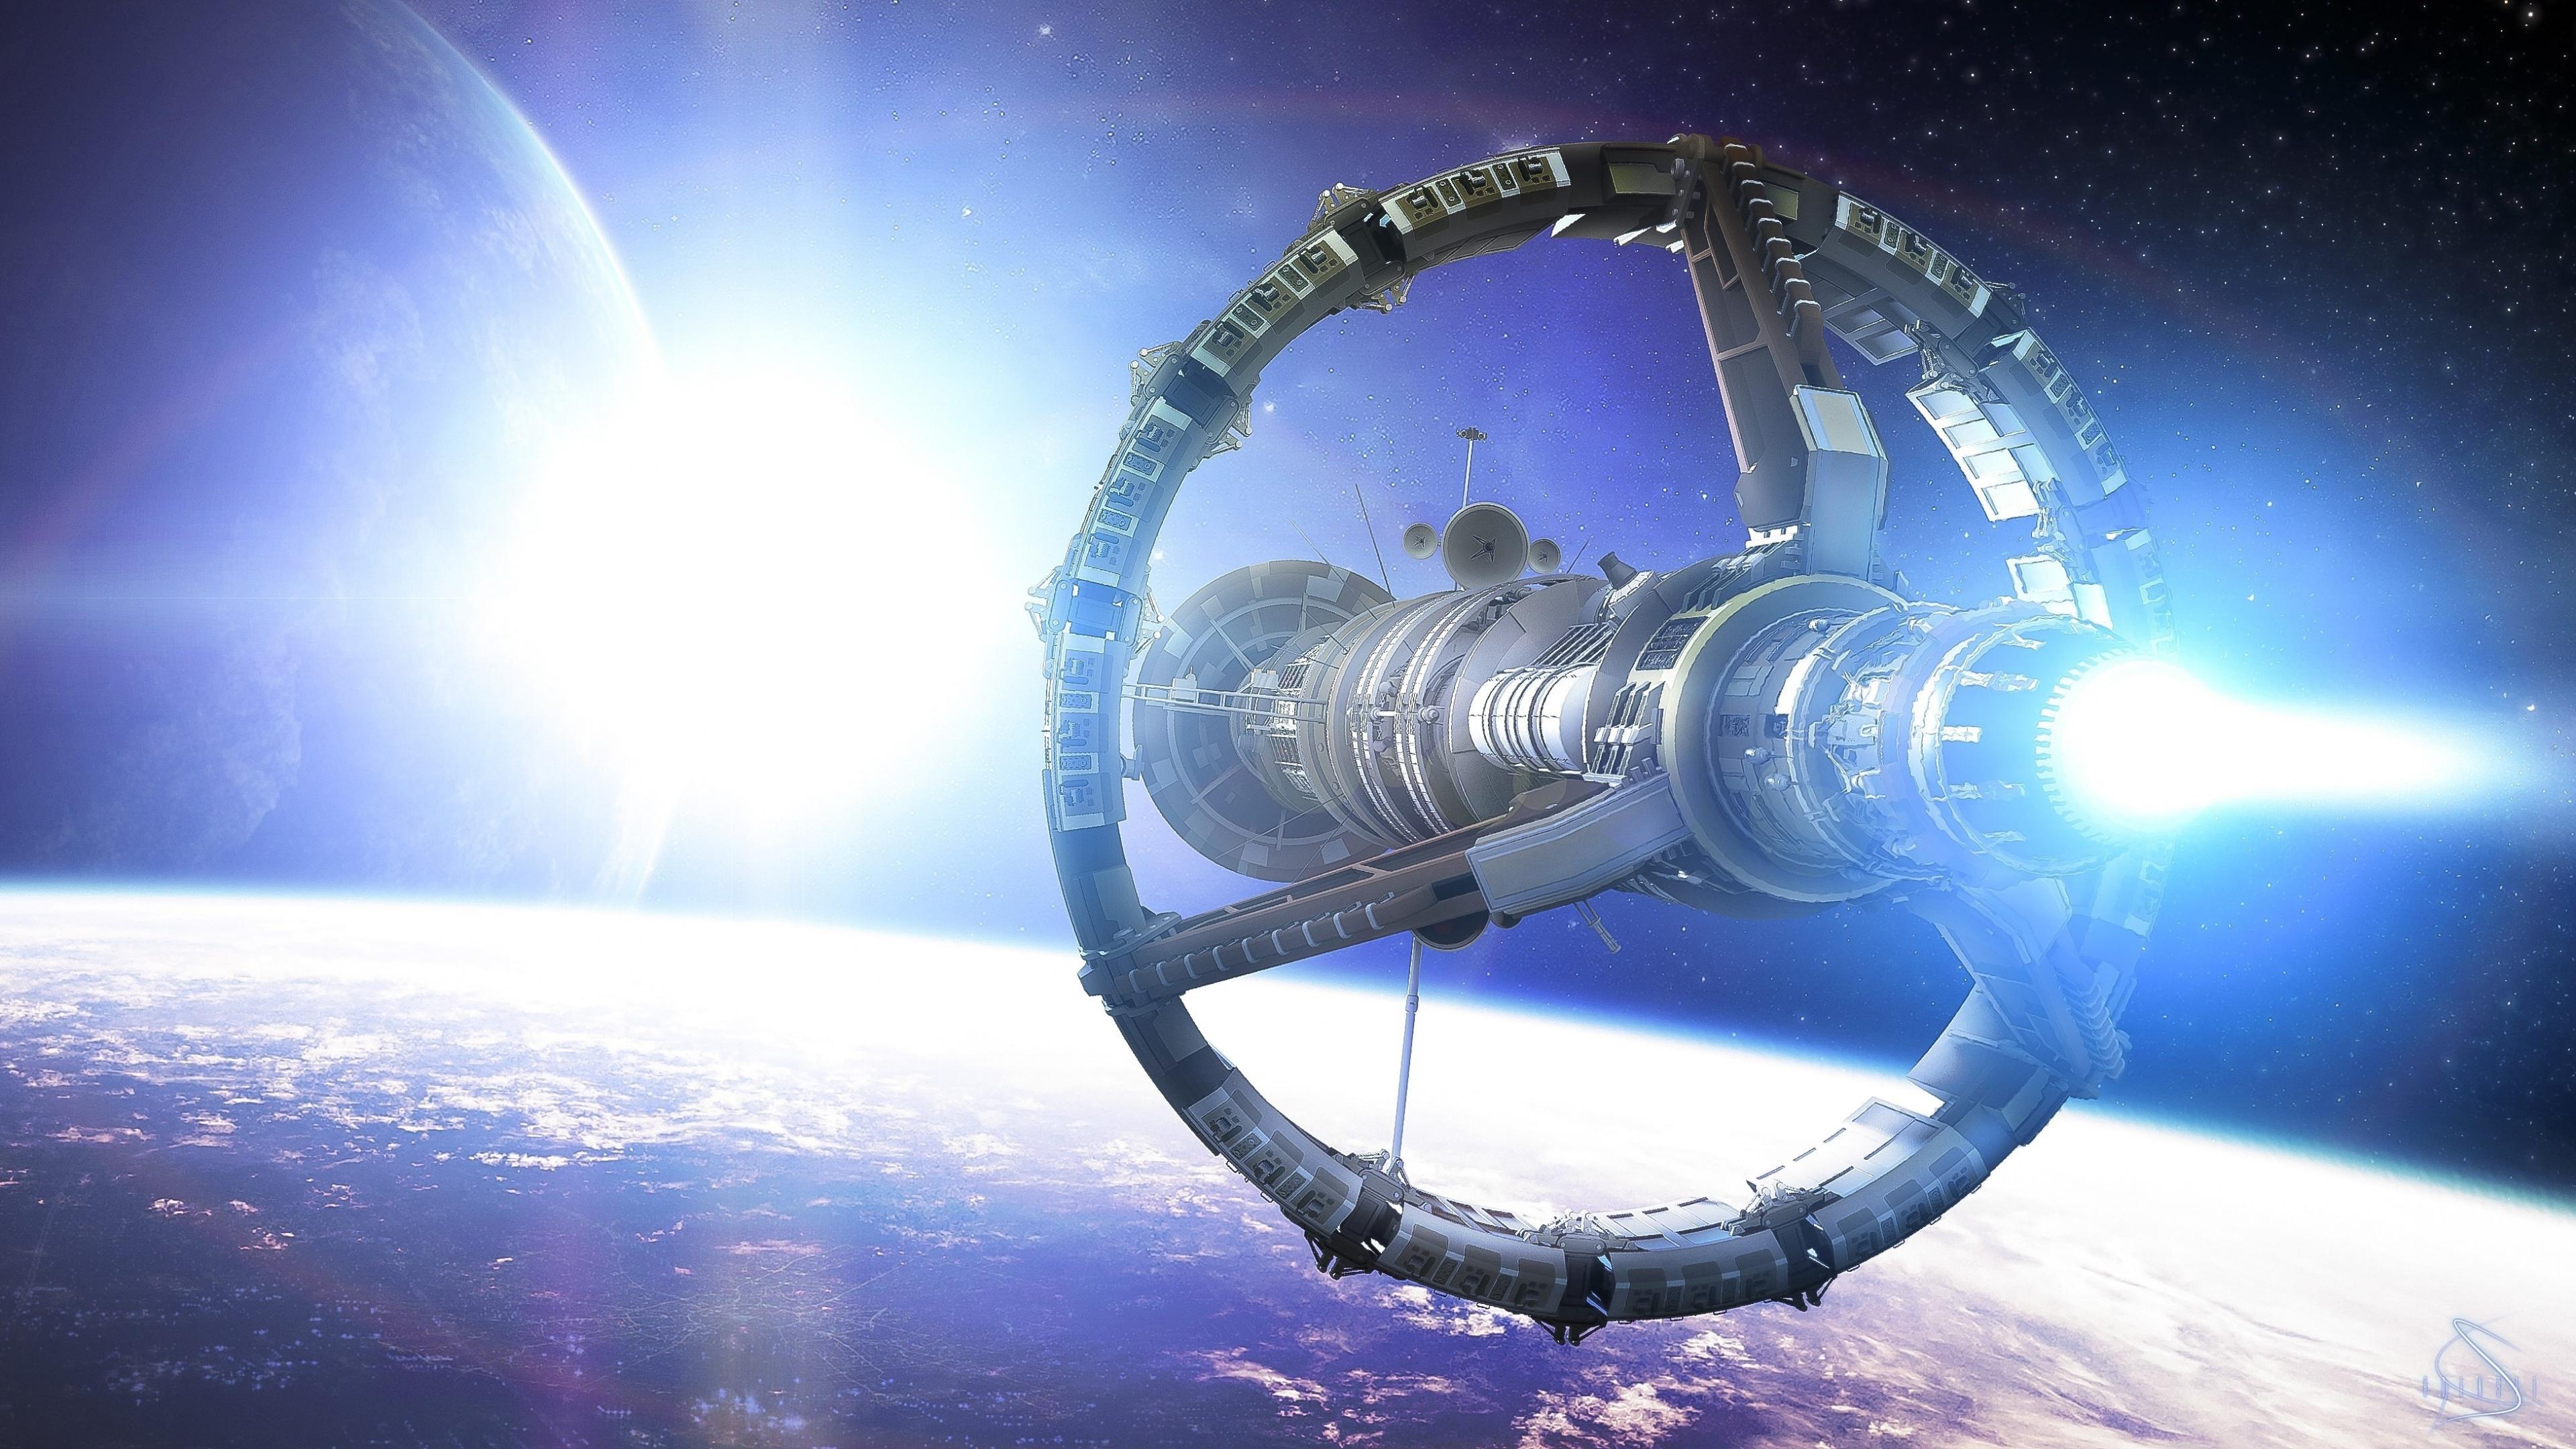 3840x2160 Wallpaper space planet ship art star 3840x2160